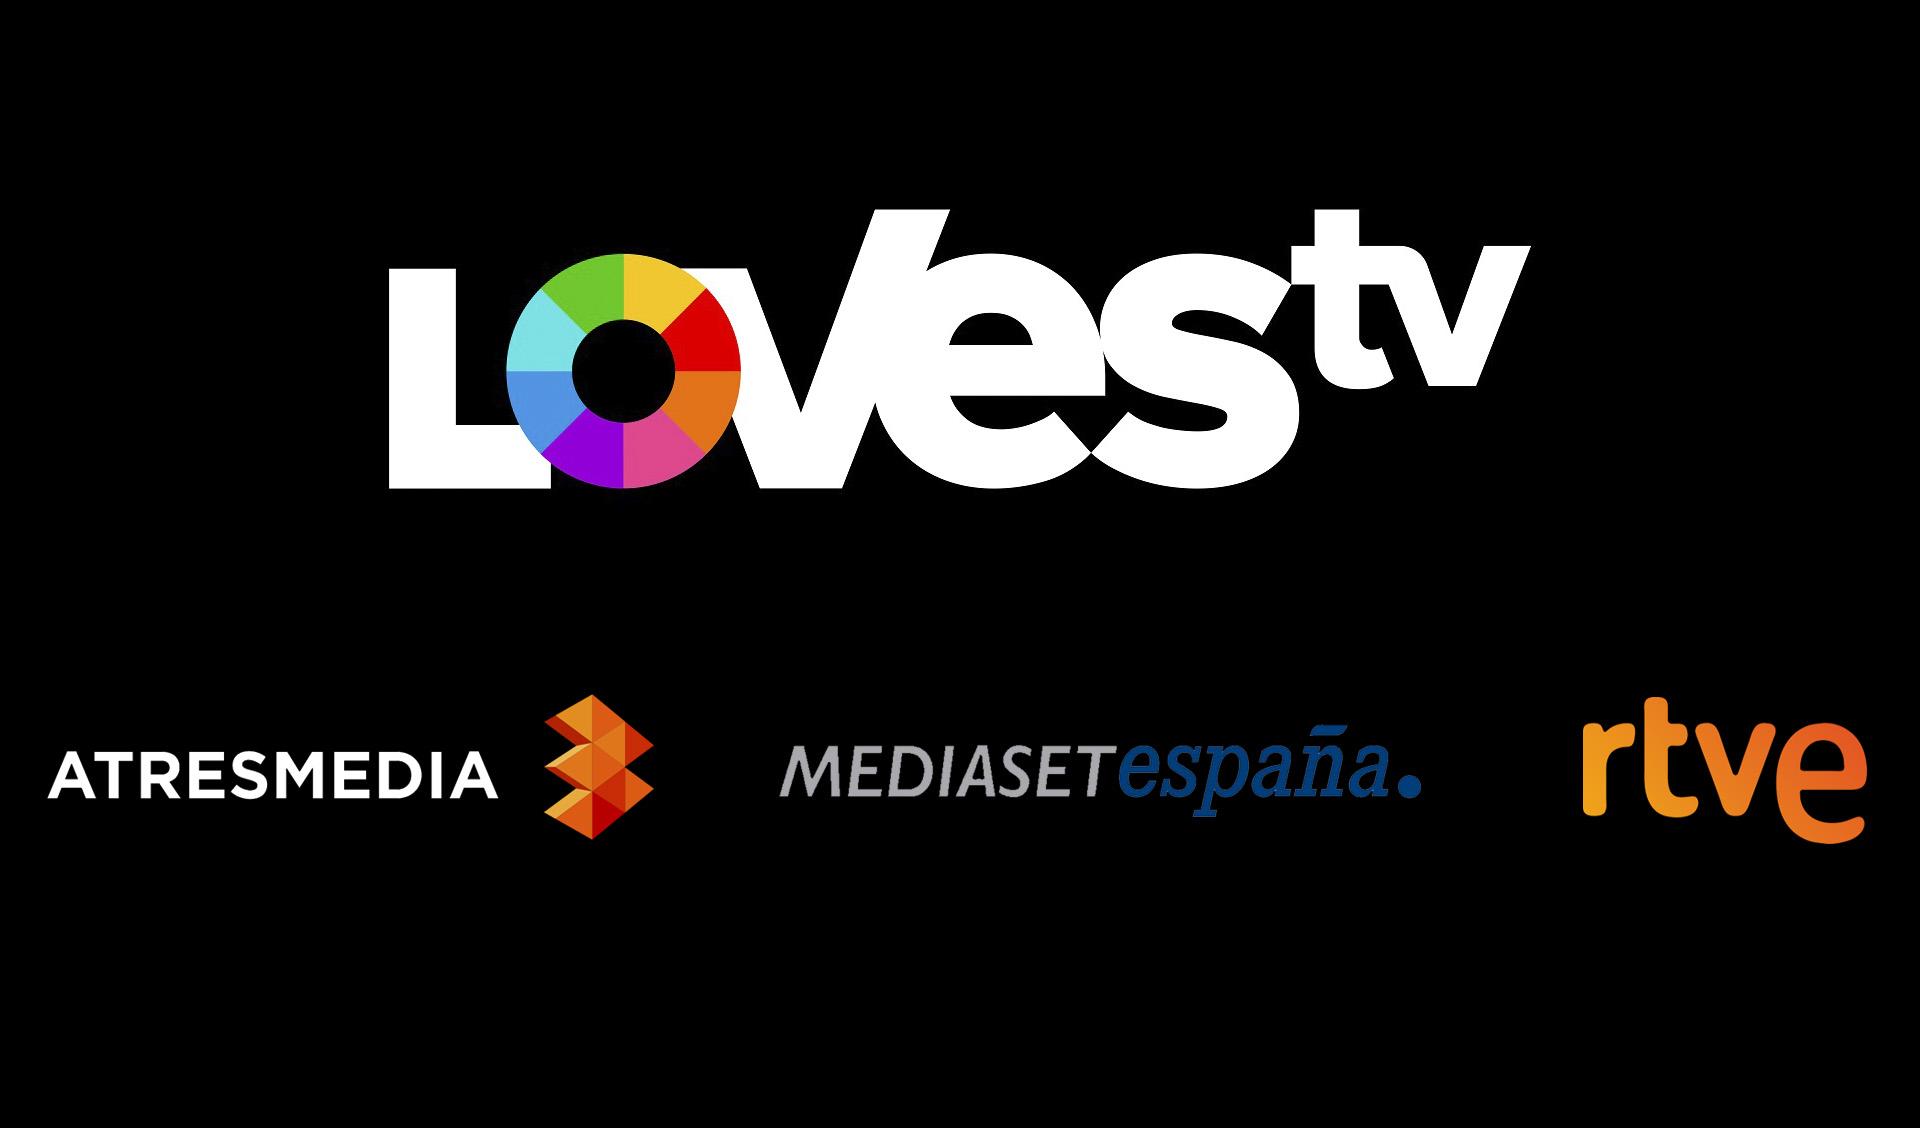 Así es LovesTV, la plataforma gratuita de contenido audiovisual.